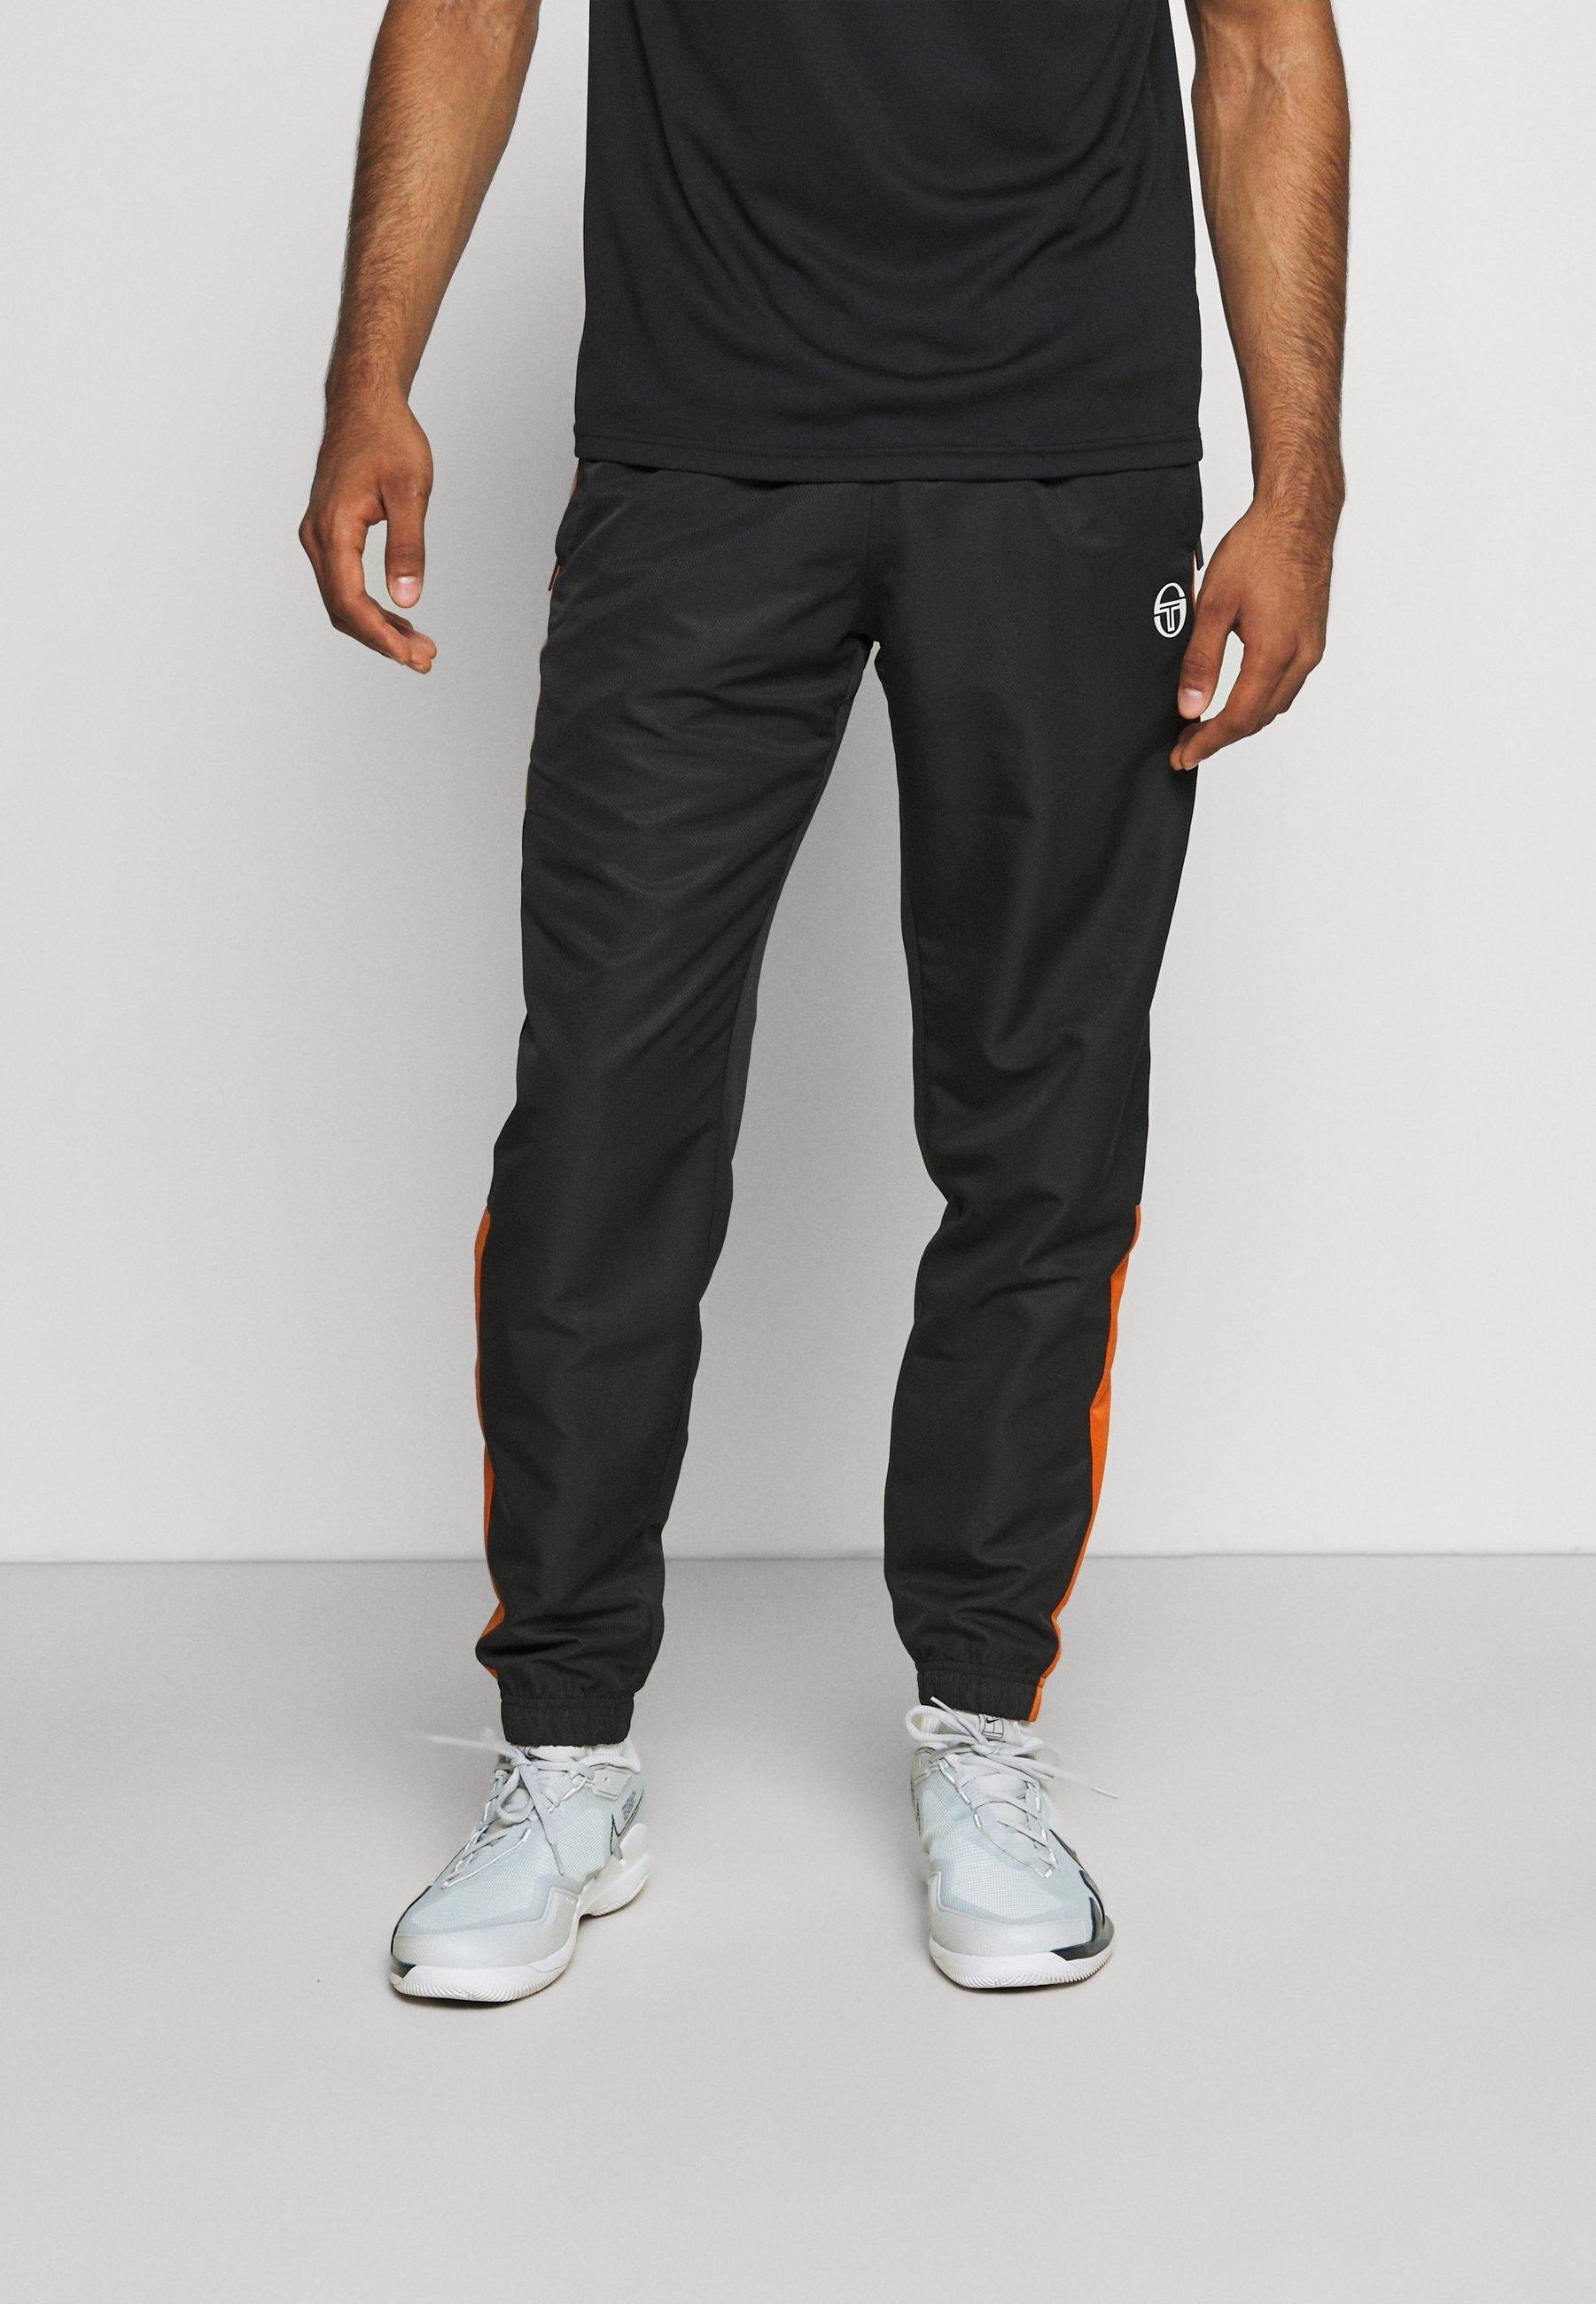 Uomo ABITA PANTS - Pantaloni sportivi